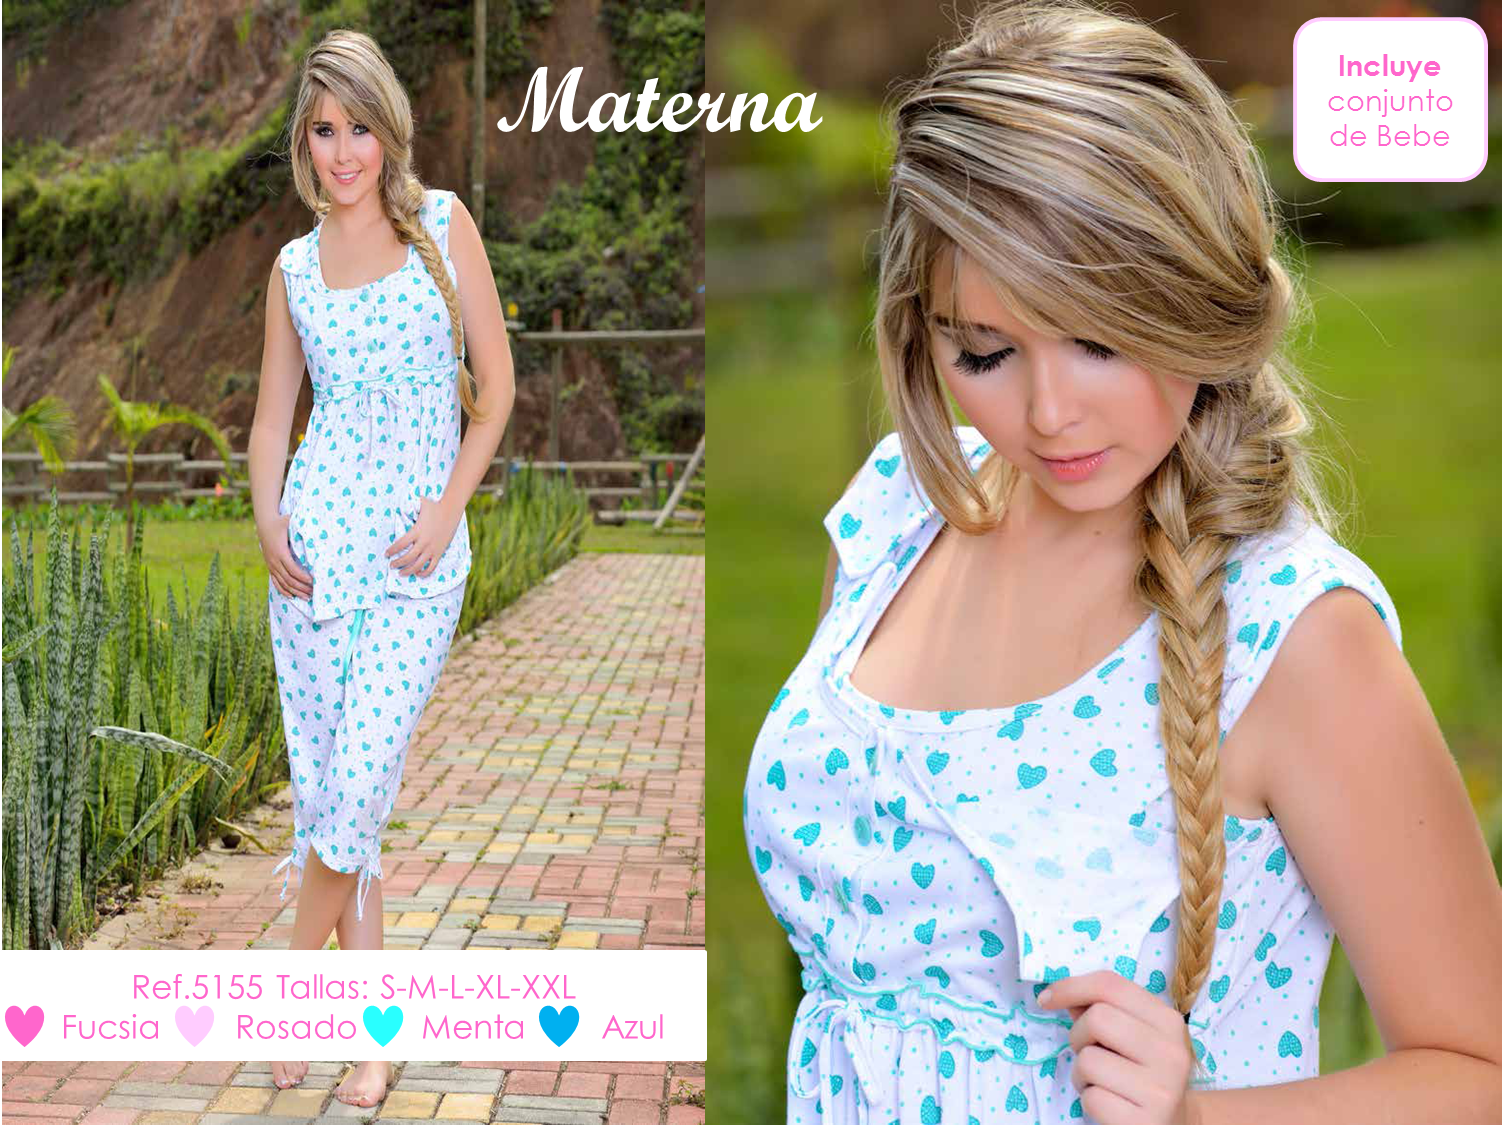 Hermosa Pijama Materna varias tallas, Incluye conjunto Bebe.